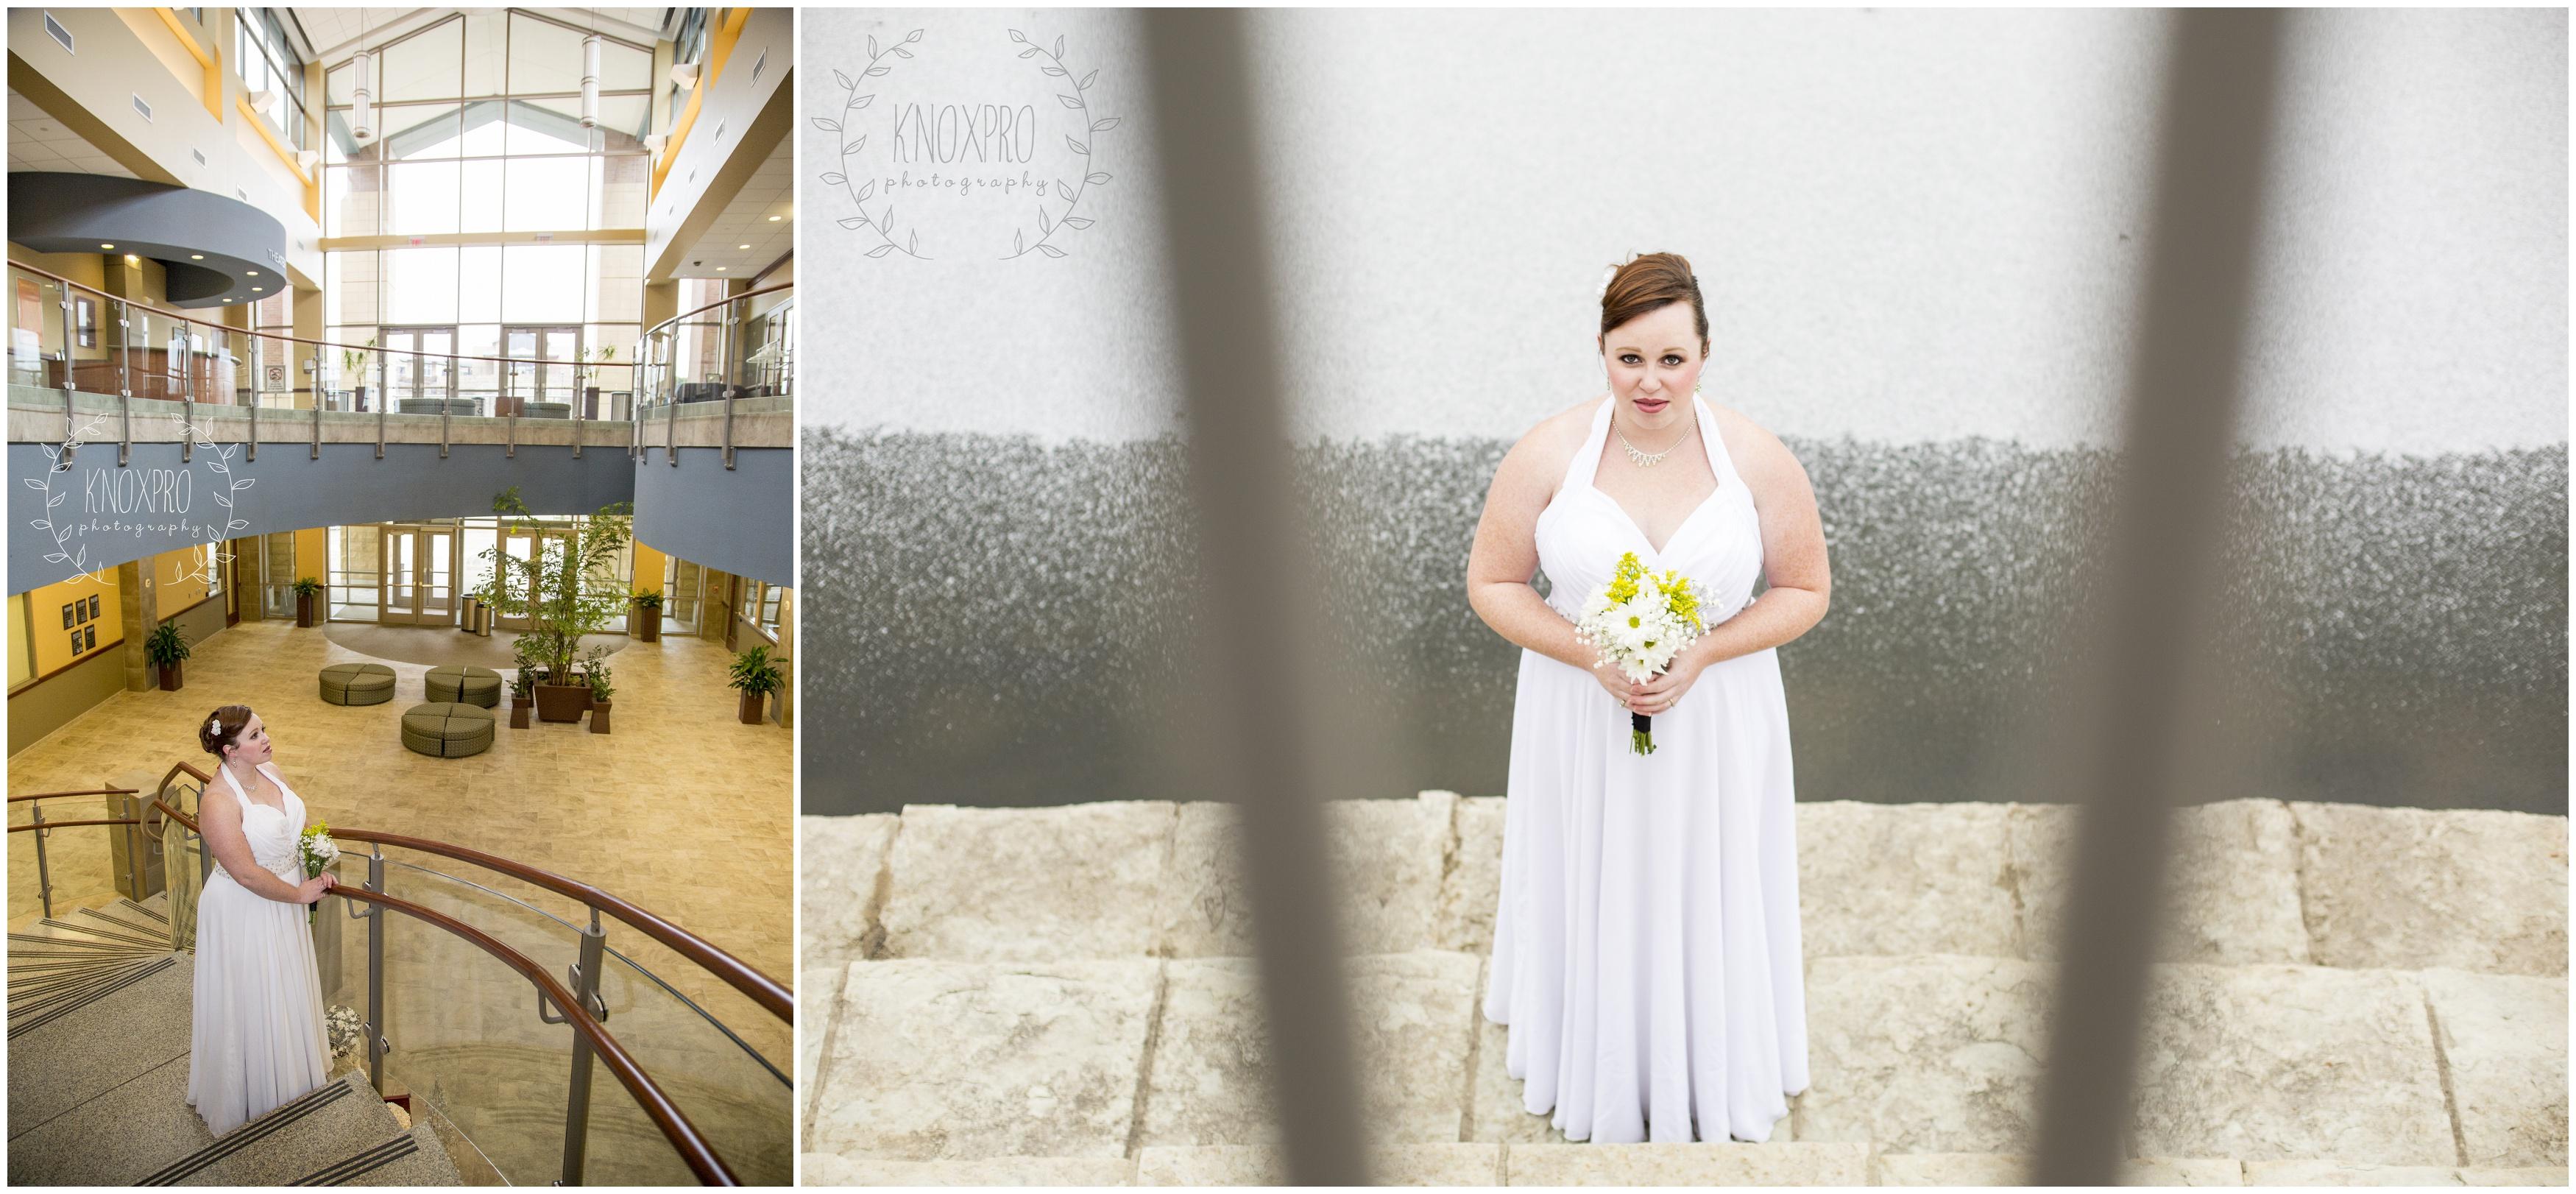 Cincinnati Wedding Pographers   Styled Bridal Portrait Session By Knox Pro Photography Cincinnati